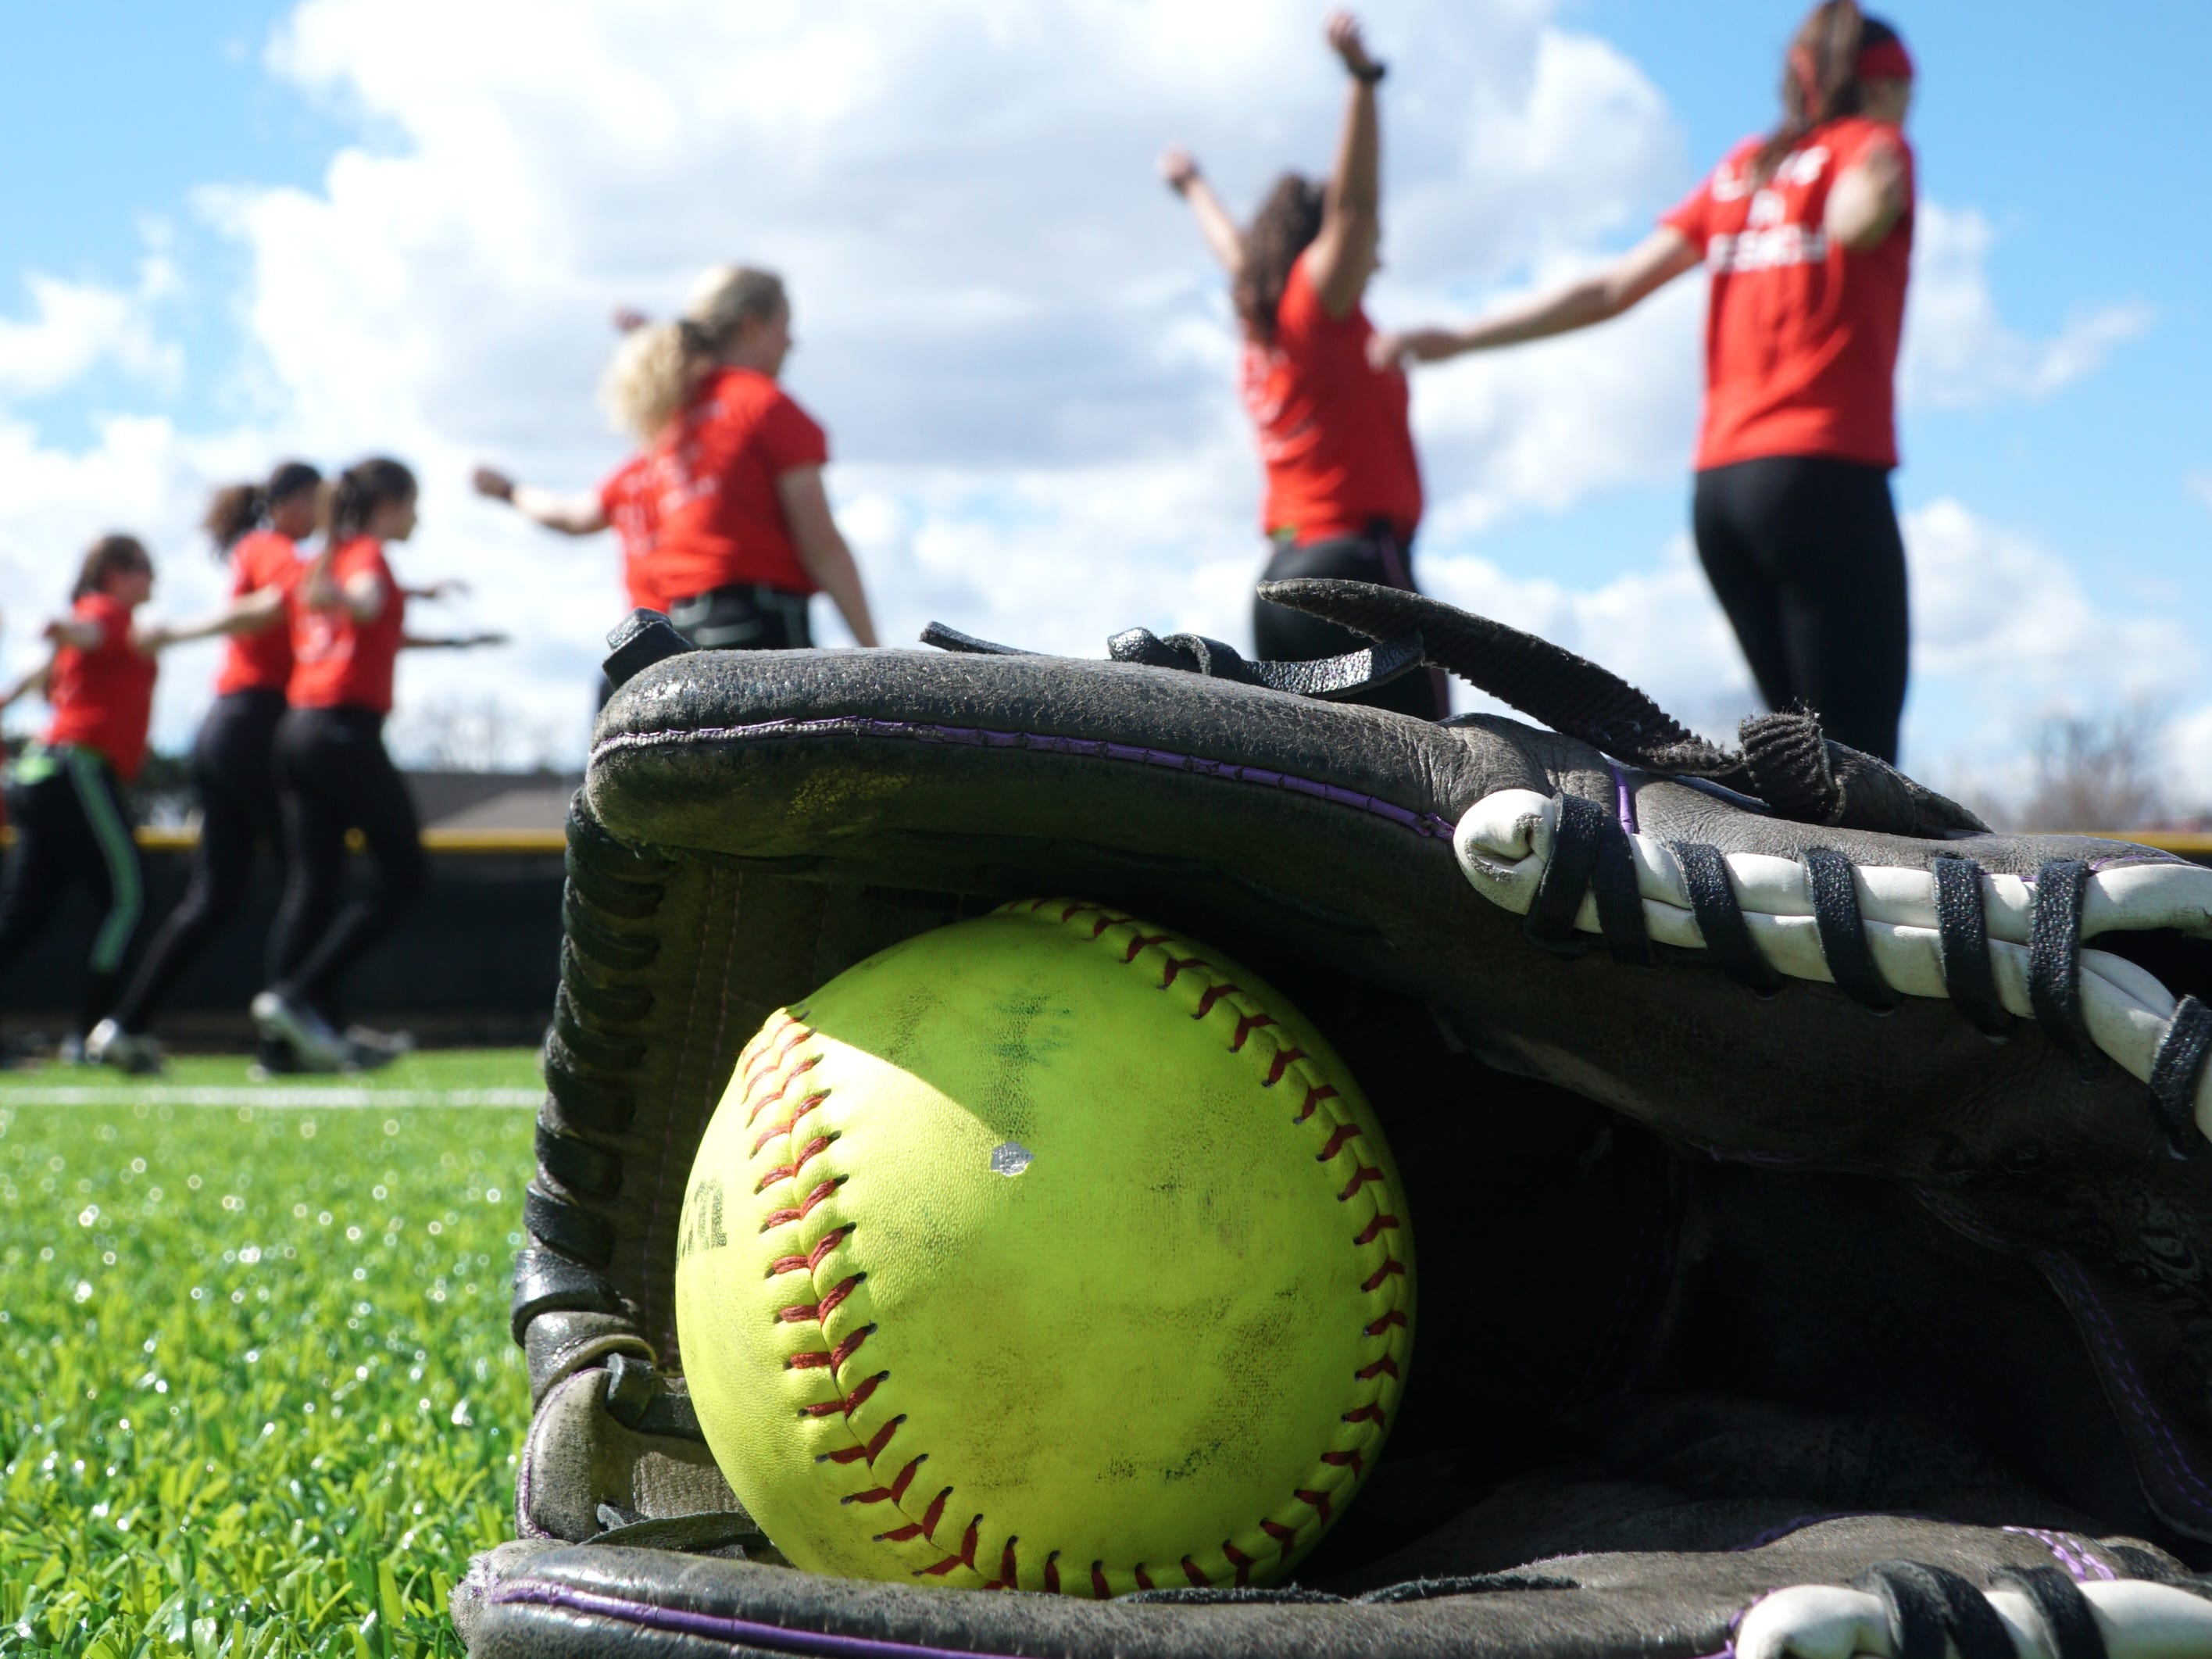 The Livonia Churchill varsity softball team warms up on April  9.